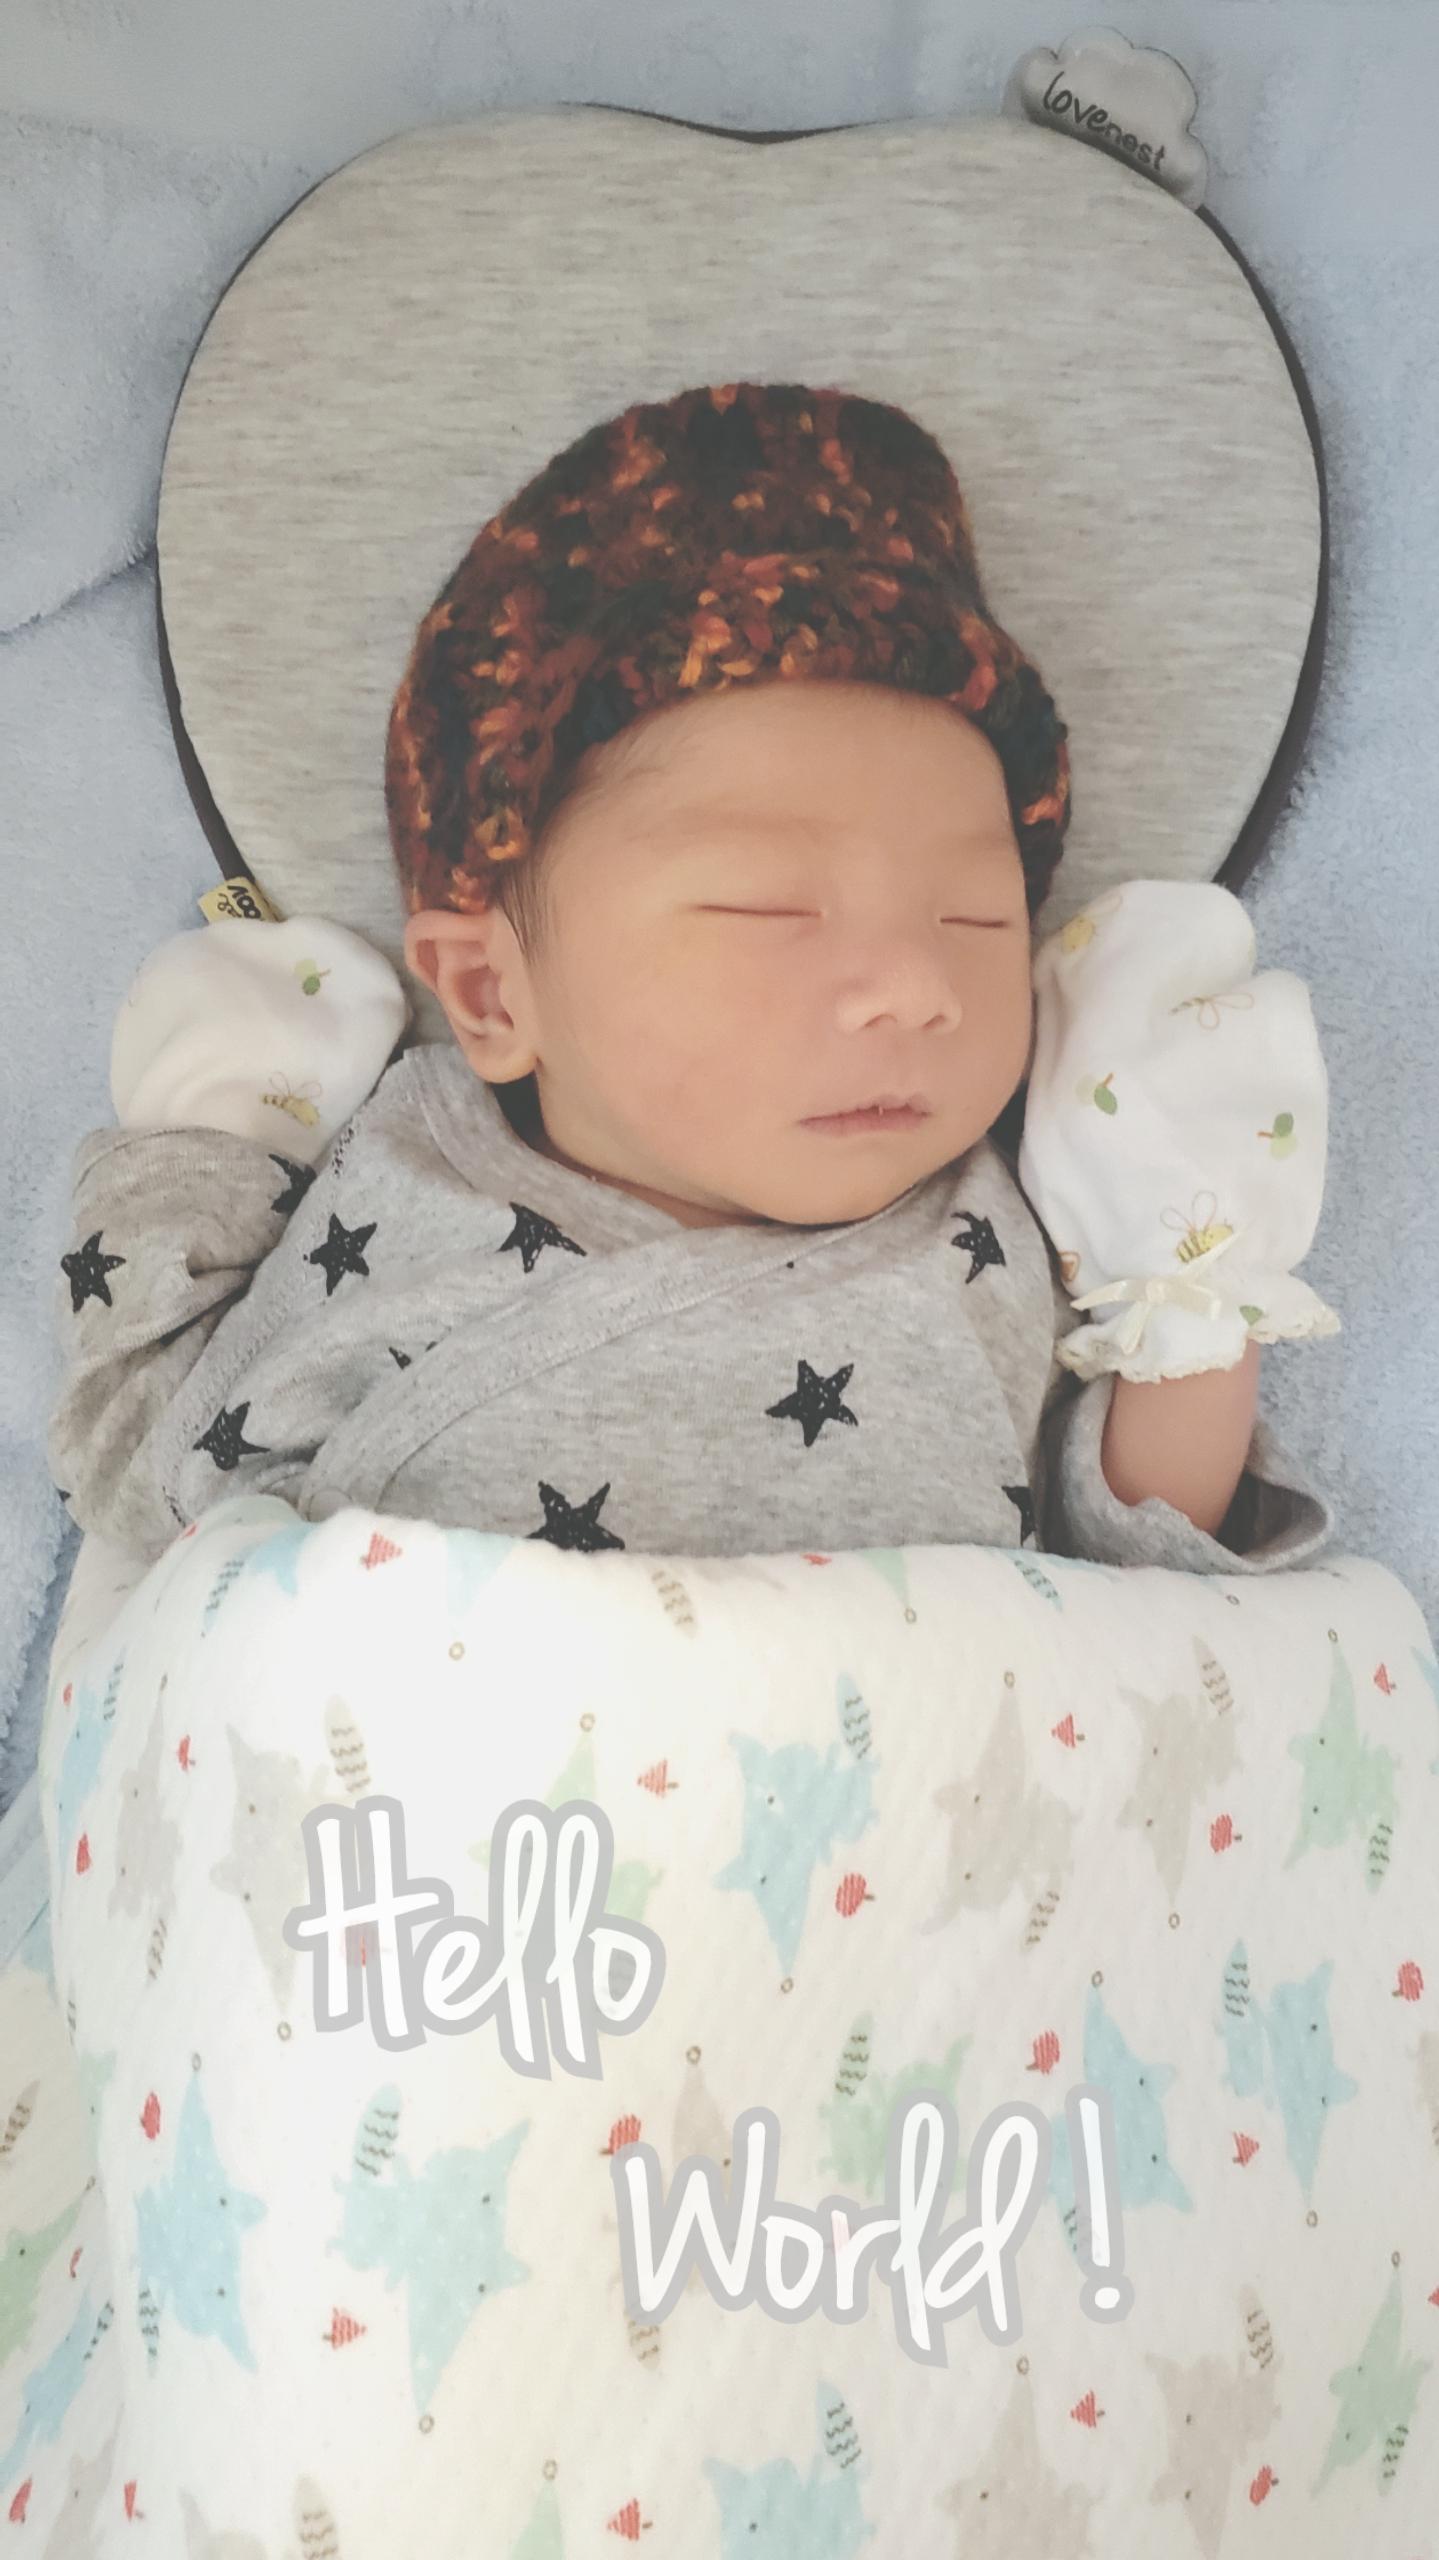 【懷孕 / Pregnancy】我的生產日記 My birth story – Amy's Life Project